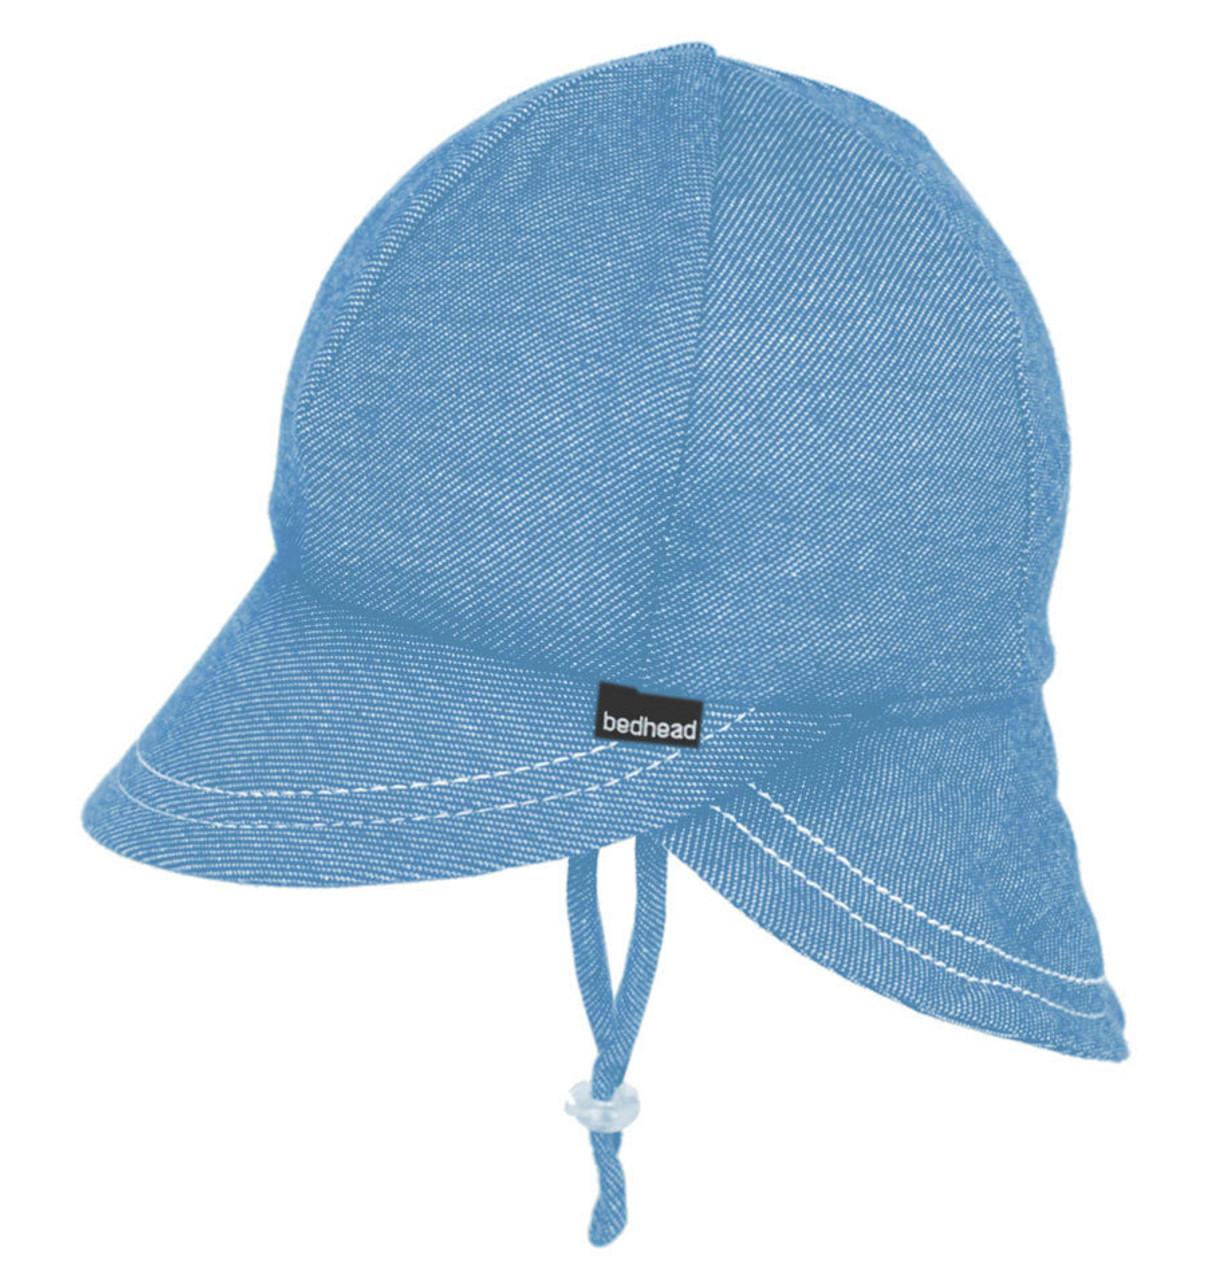 Bedhead UPF 50 Legionnaire Boys Hat - Chambray Blue